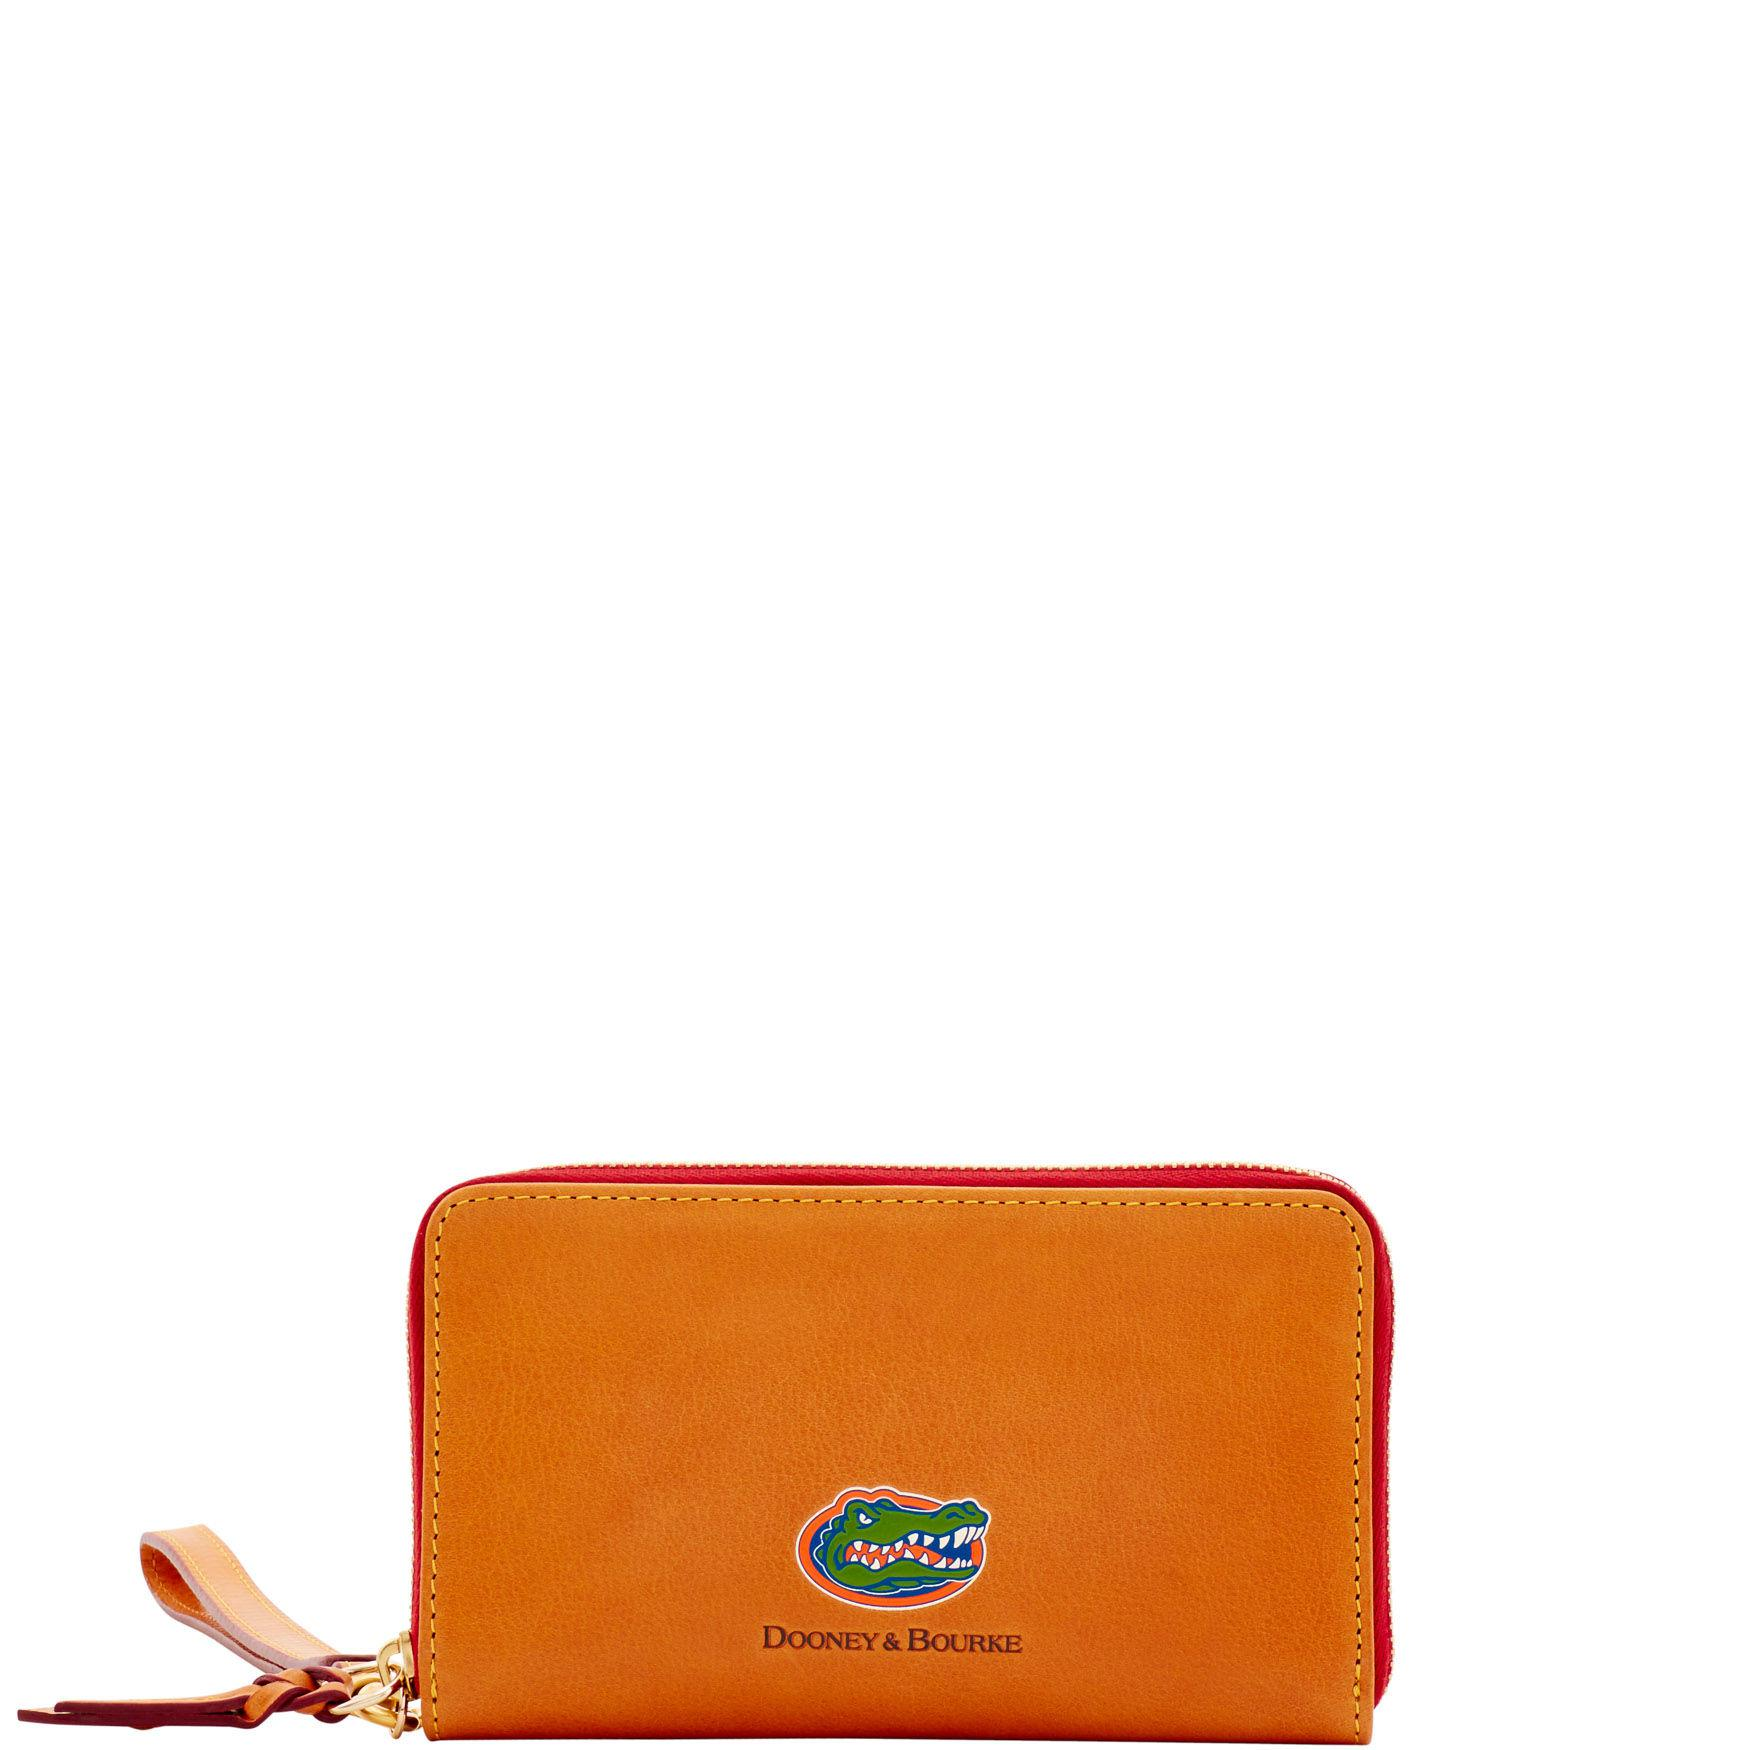 Leather Zip Around Wallet - MR. CARDINAL by VIDA VIDA 2gb8lkop2K